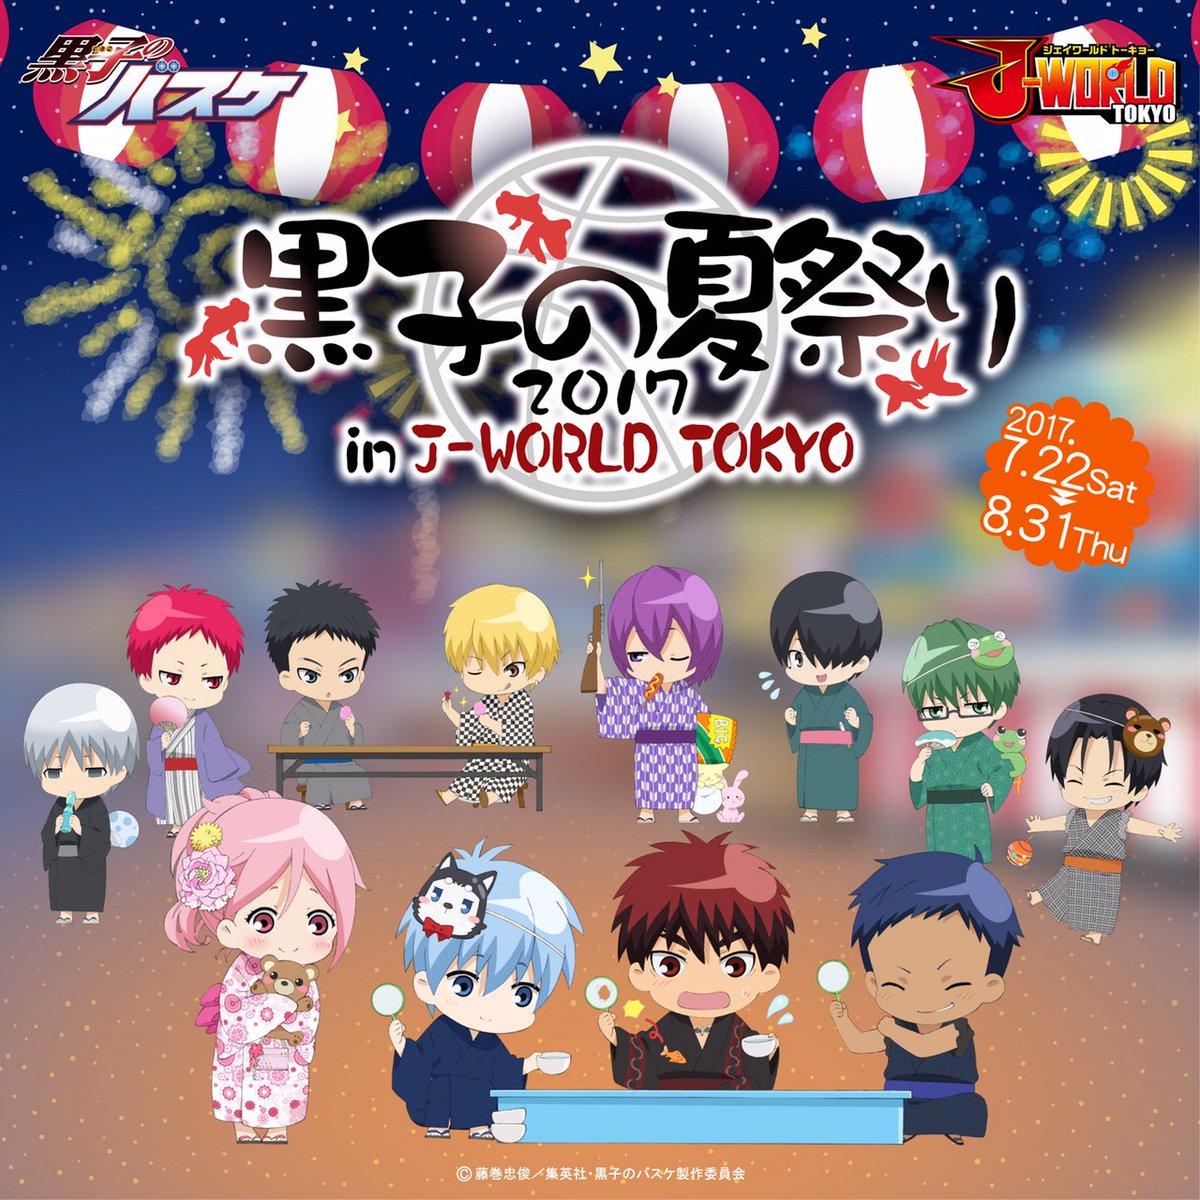 【J-WORLD】7月22日(土)より、「黒子の夏祭り2017 in J-WORLD TOKYO」開催決定!浴衣姿で夏祭りを楽しむ描き下ろしちびキャラがかわいいですね!詳細は後日発表します、お楽しみに♪ tv.kurobas.com/goods/2017/06/…  #kurobas